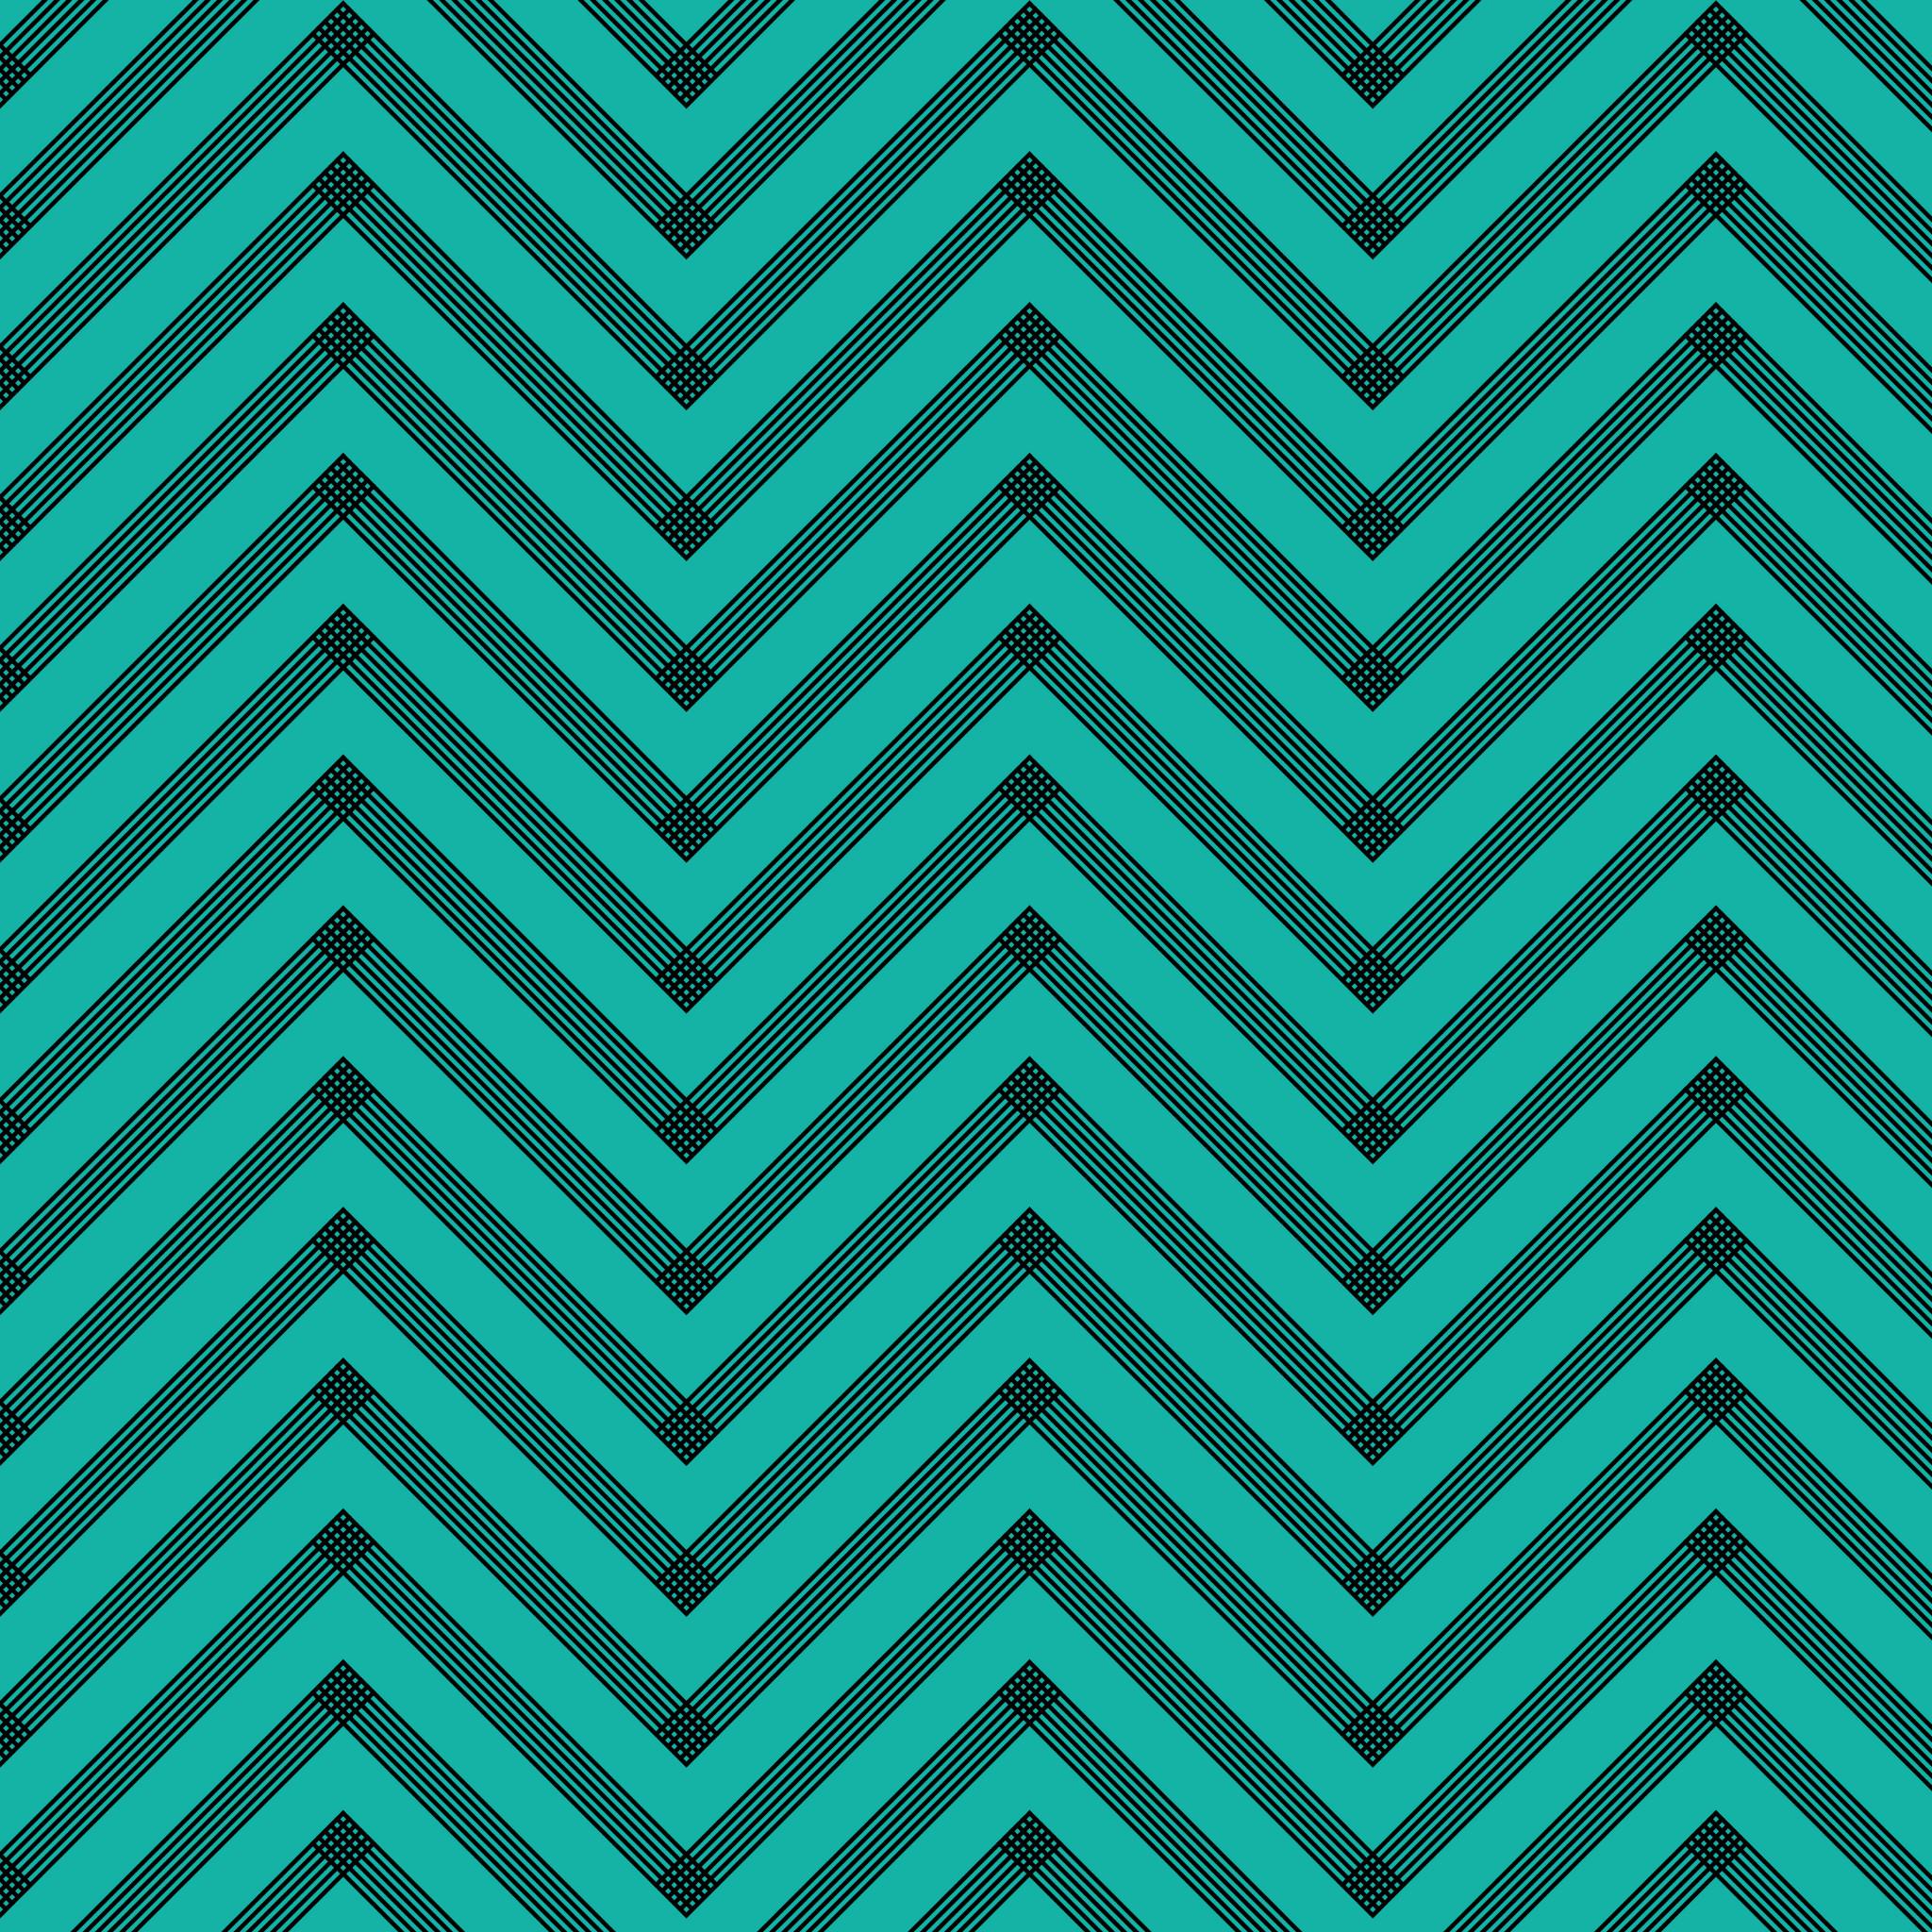 background tumblr pattern sketchy wide chevron zig zag 2048x2048